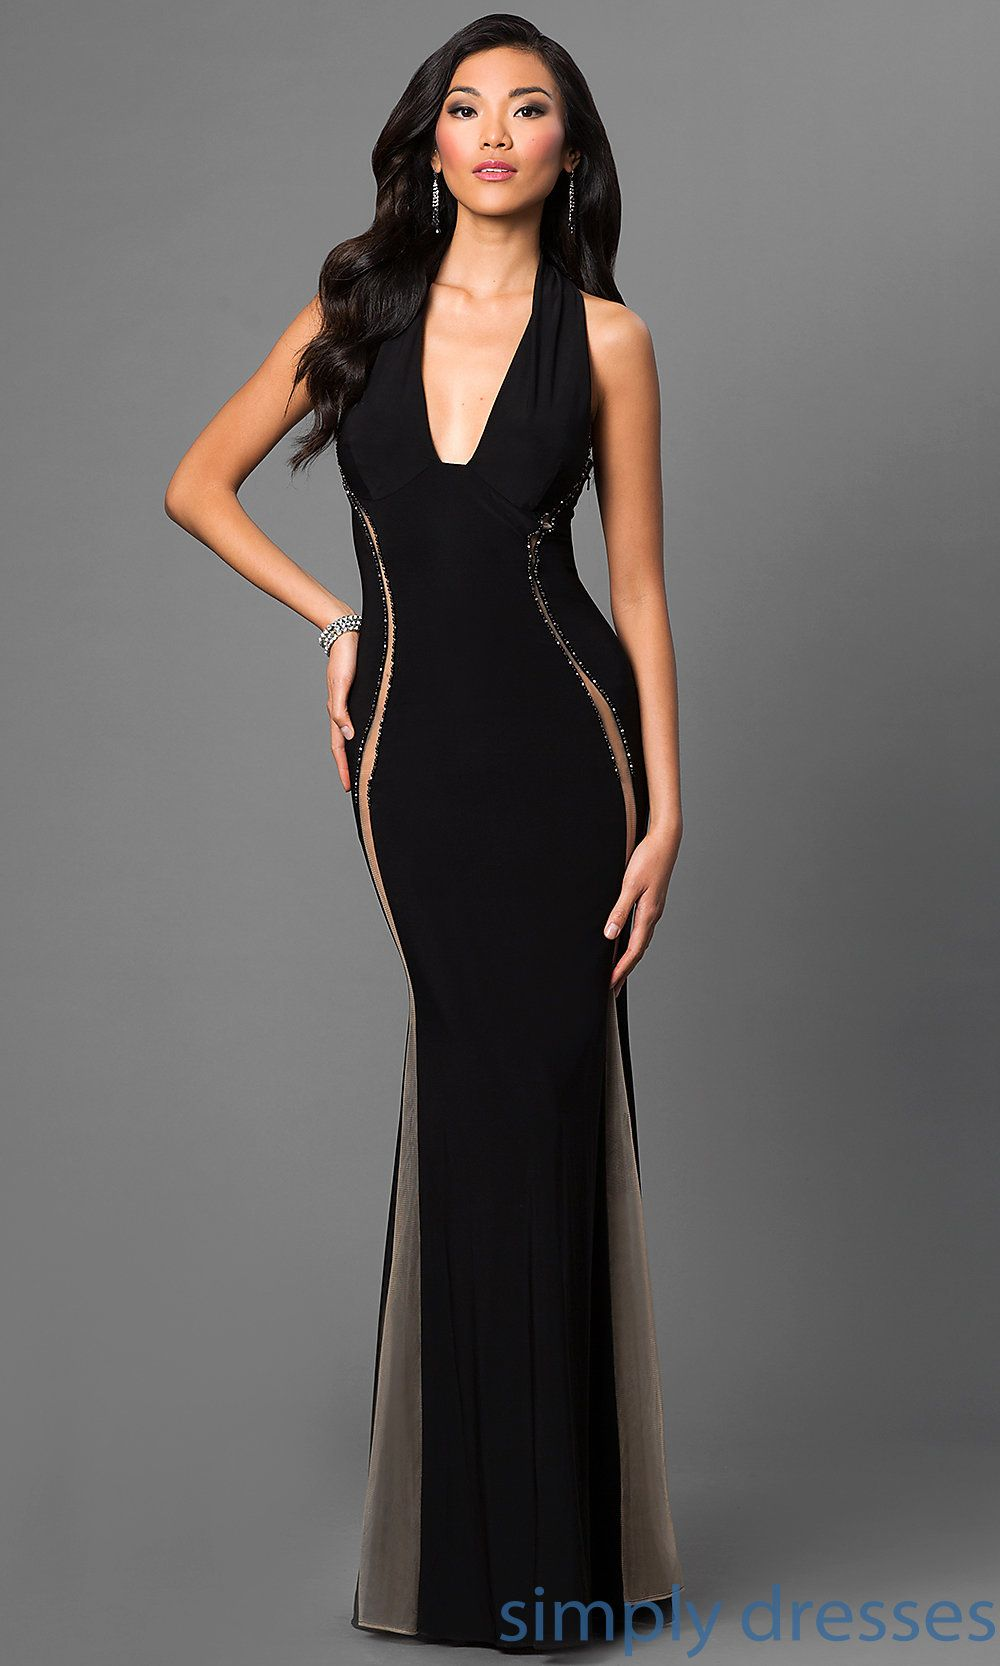 Homecoming dresses formal prom dresses evening wear dj